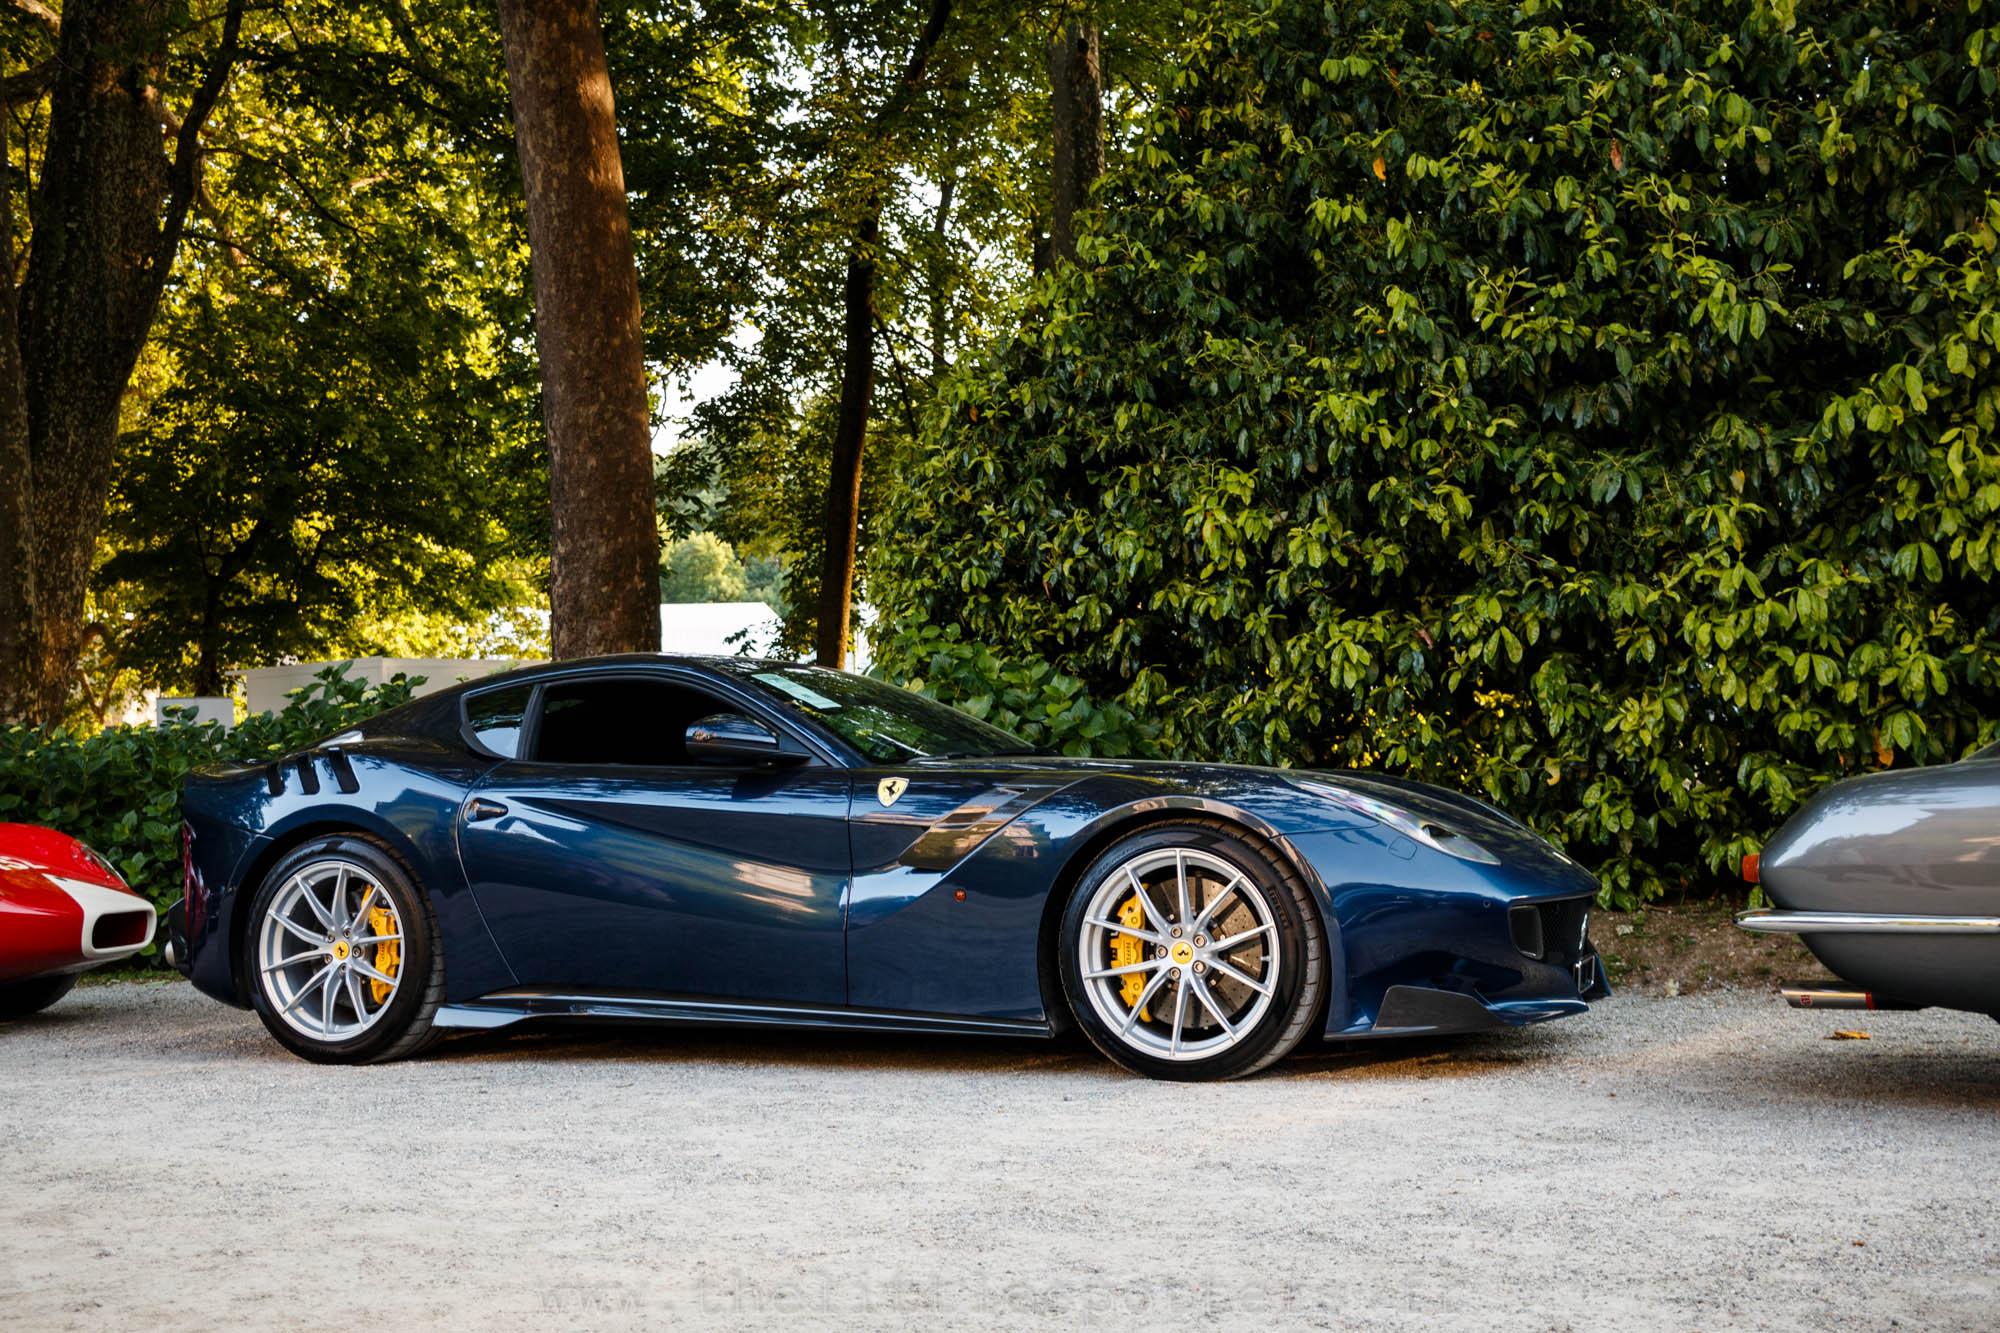 Ferrari F12 TDF, estimée entre 750 000 euros et 800 000 euros, elle atteindra seulement 675 000 euros.